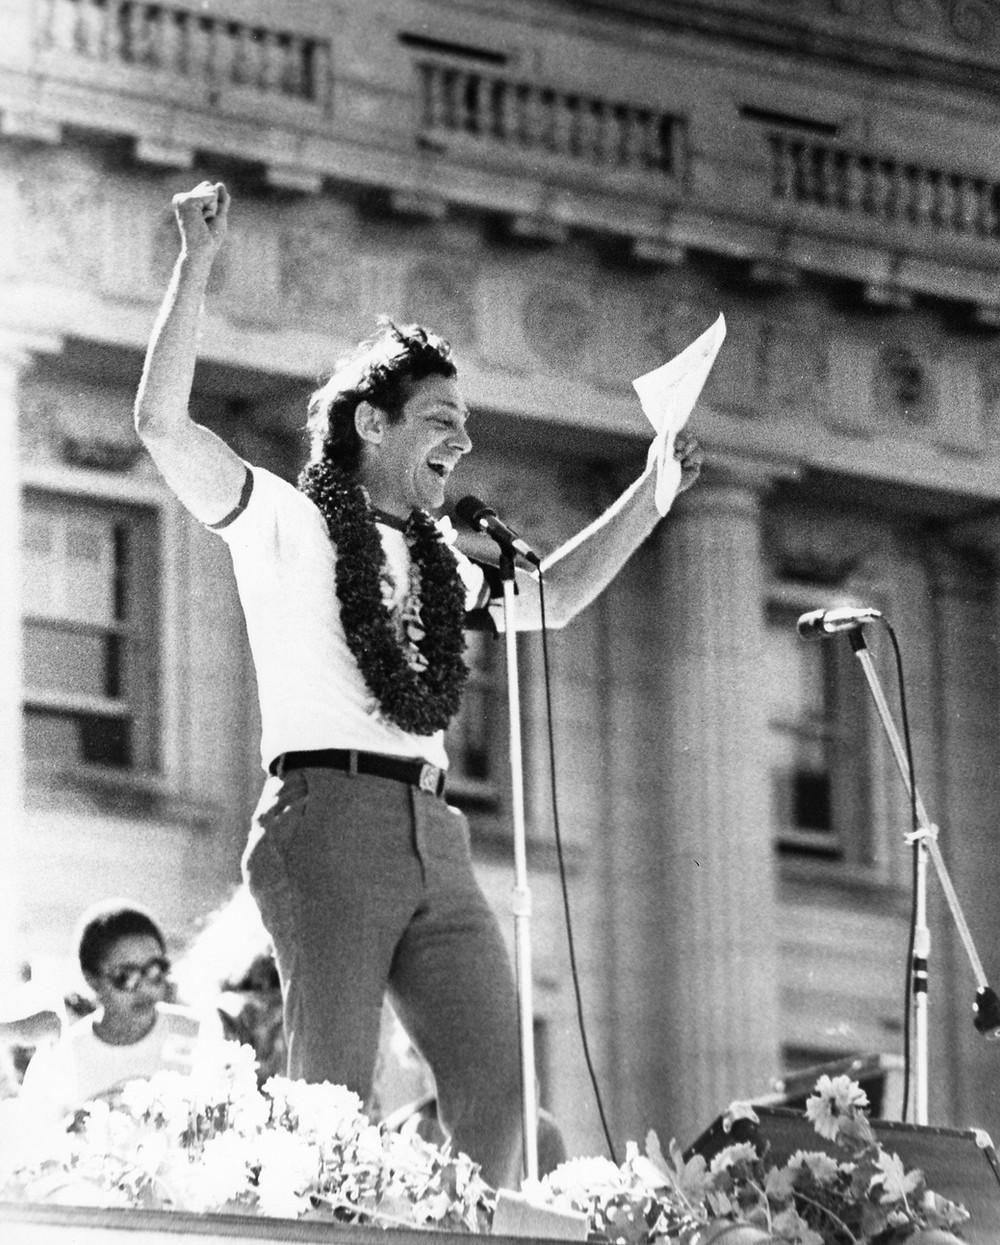 Gay rights activist and politician Harvey Milk